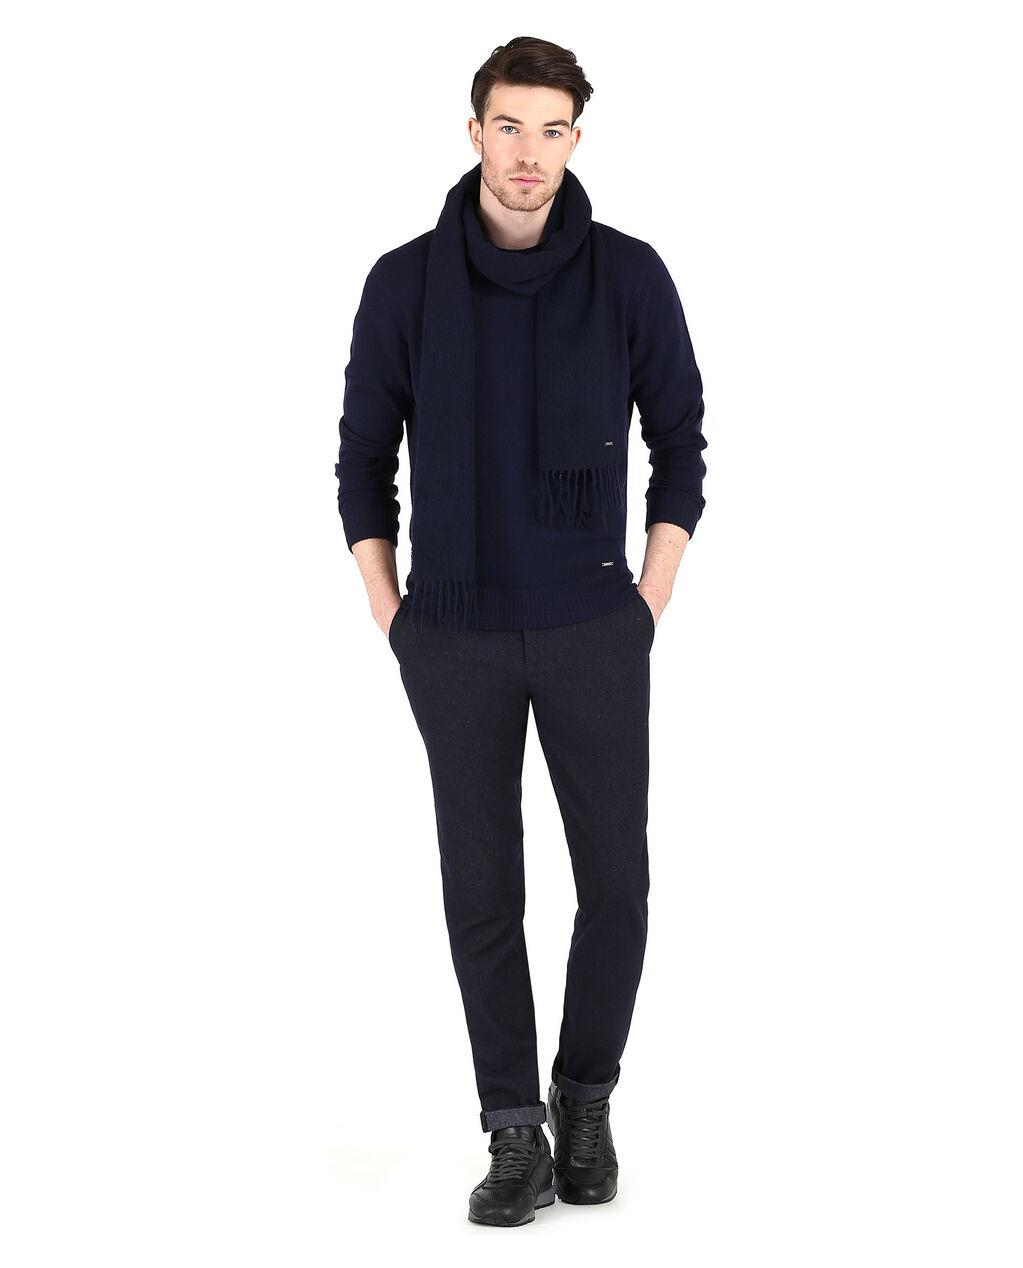 woolrich maglieria knitwear merino crew neck womag1725 wl04. Black Bedroom Furniture Sets. Home Design Ideas